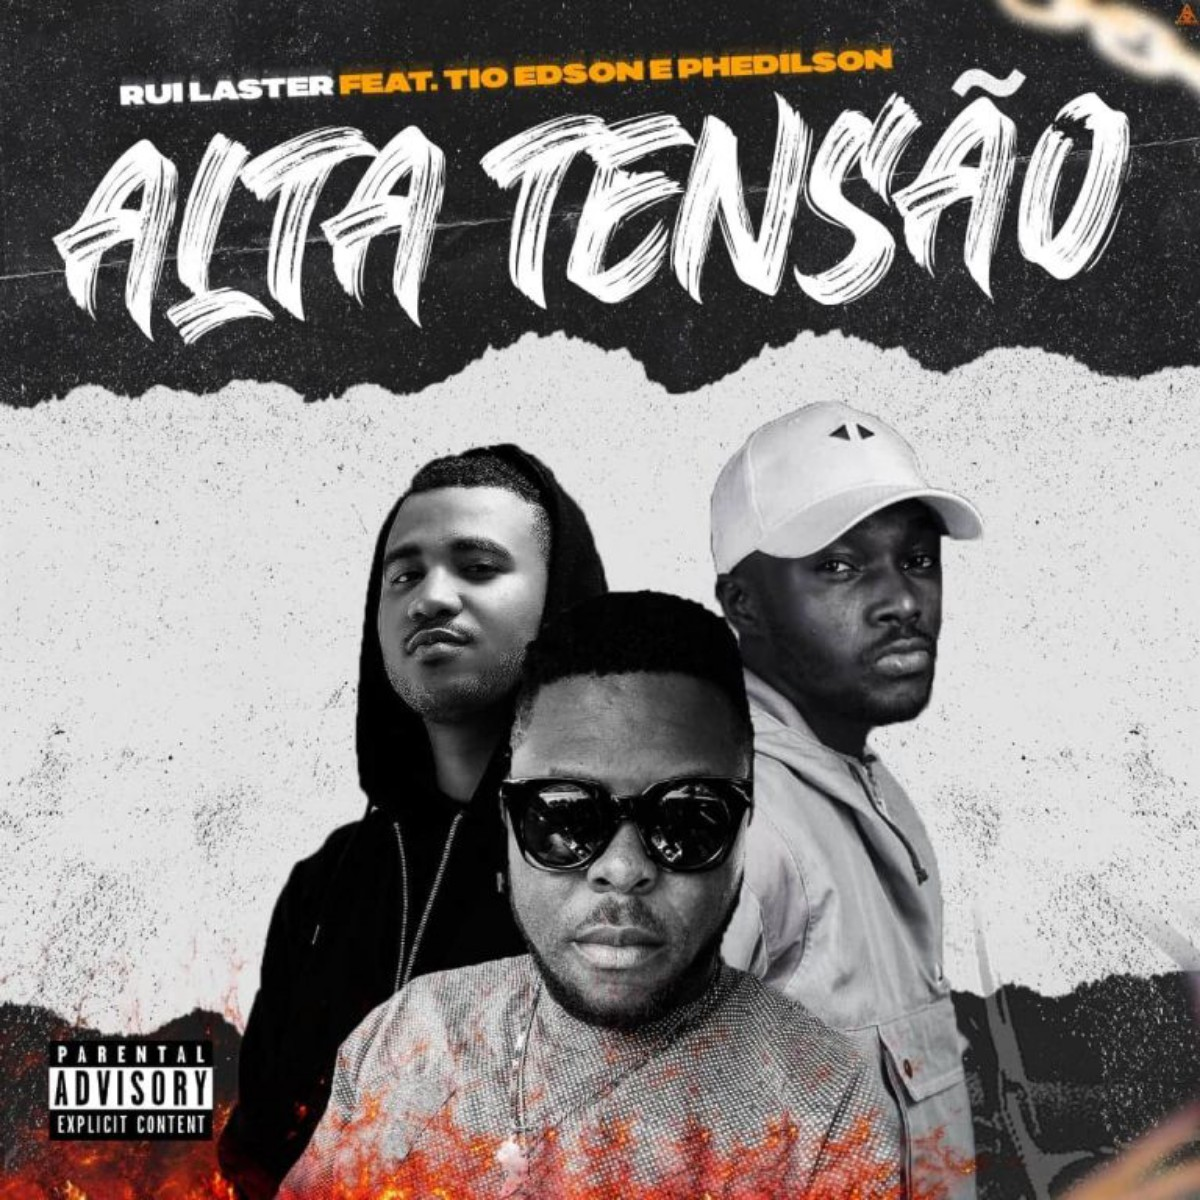 RuiLaster - Alta Tensão (feat. Tio Edson & Phedilson)